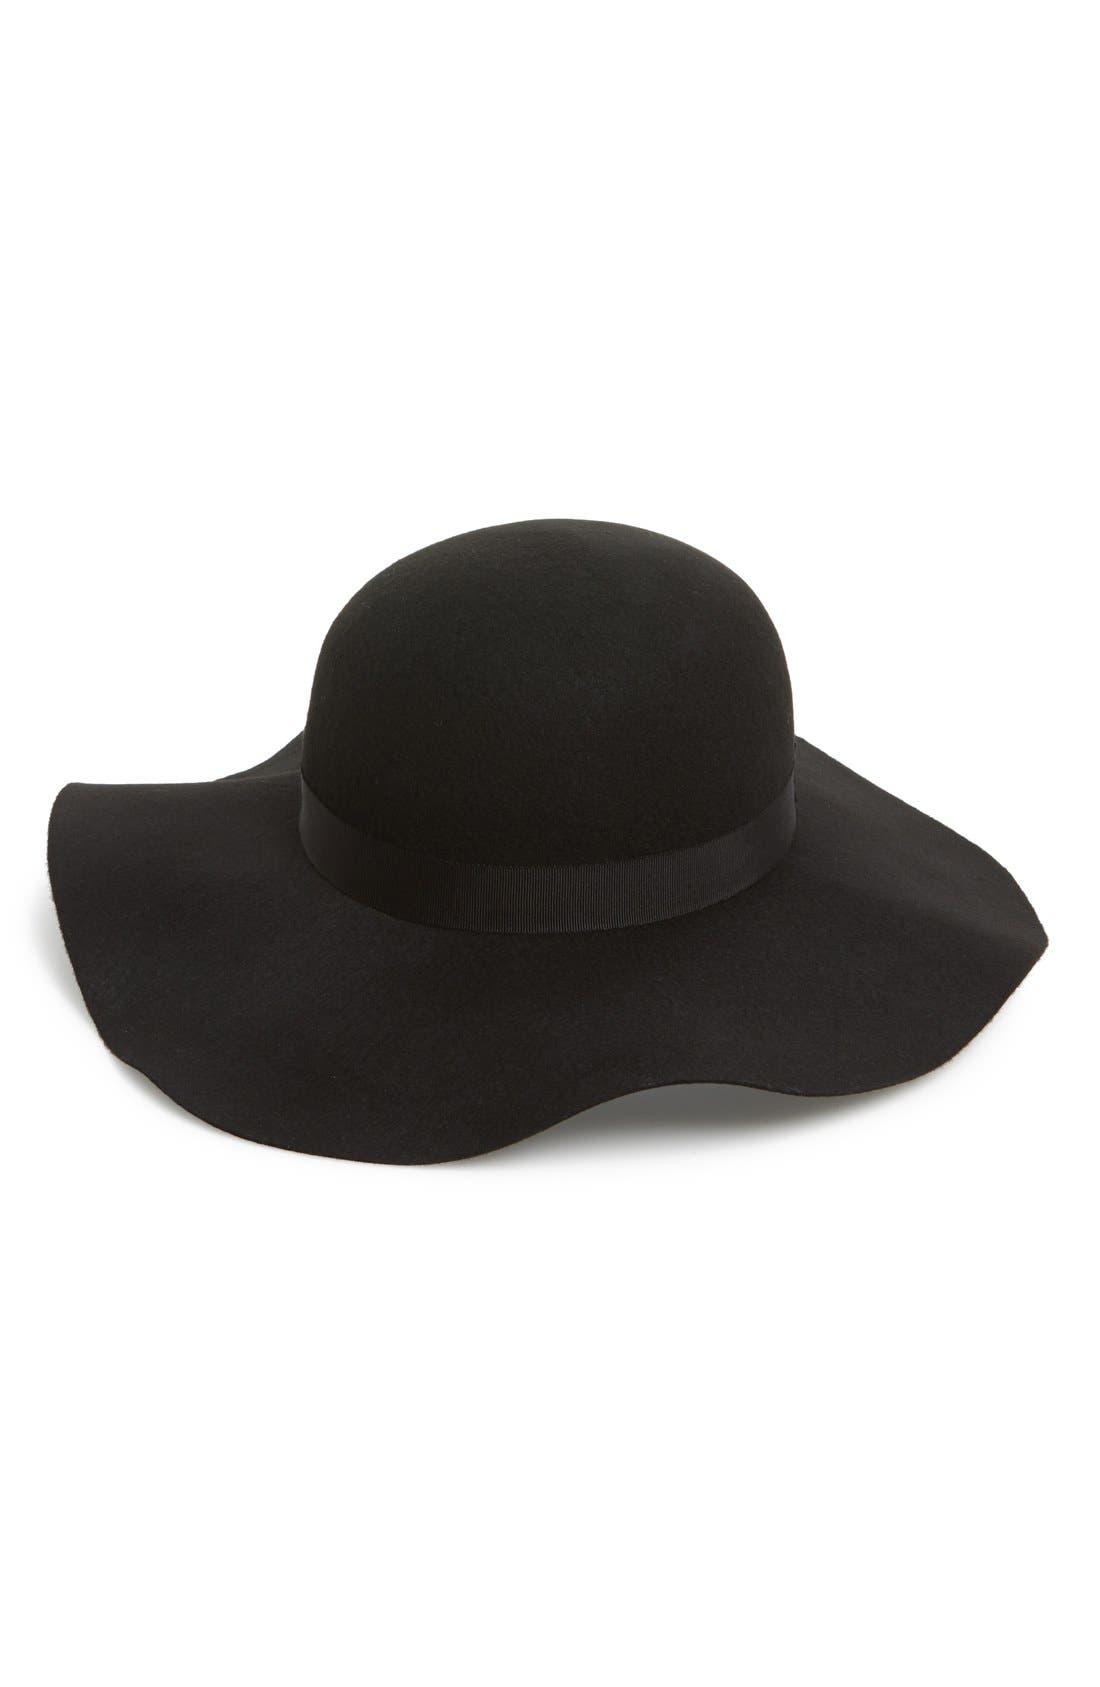 Floppy Felt Hat,                             Main thumbnail 1, color,                             001